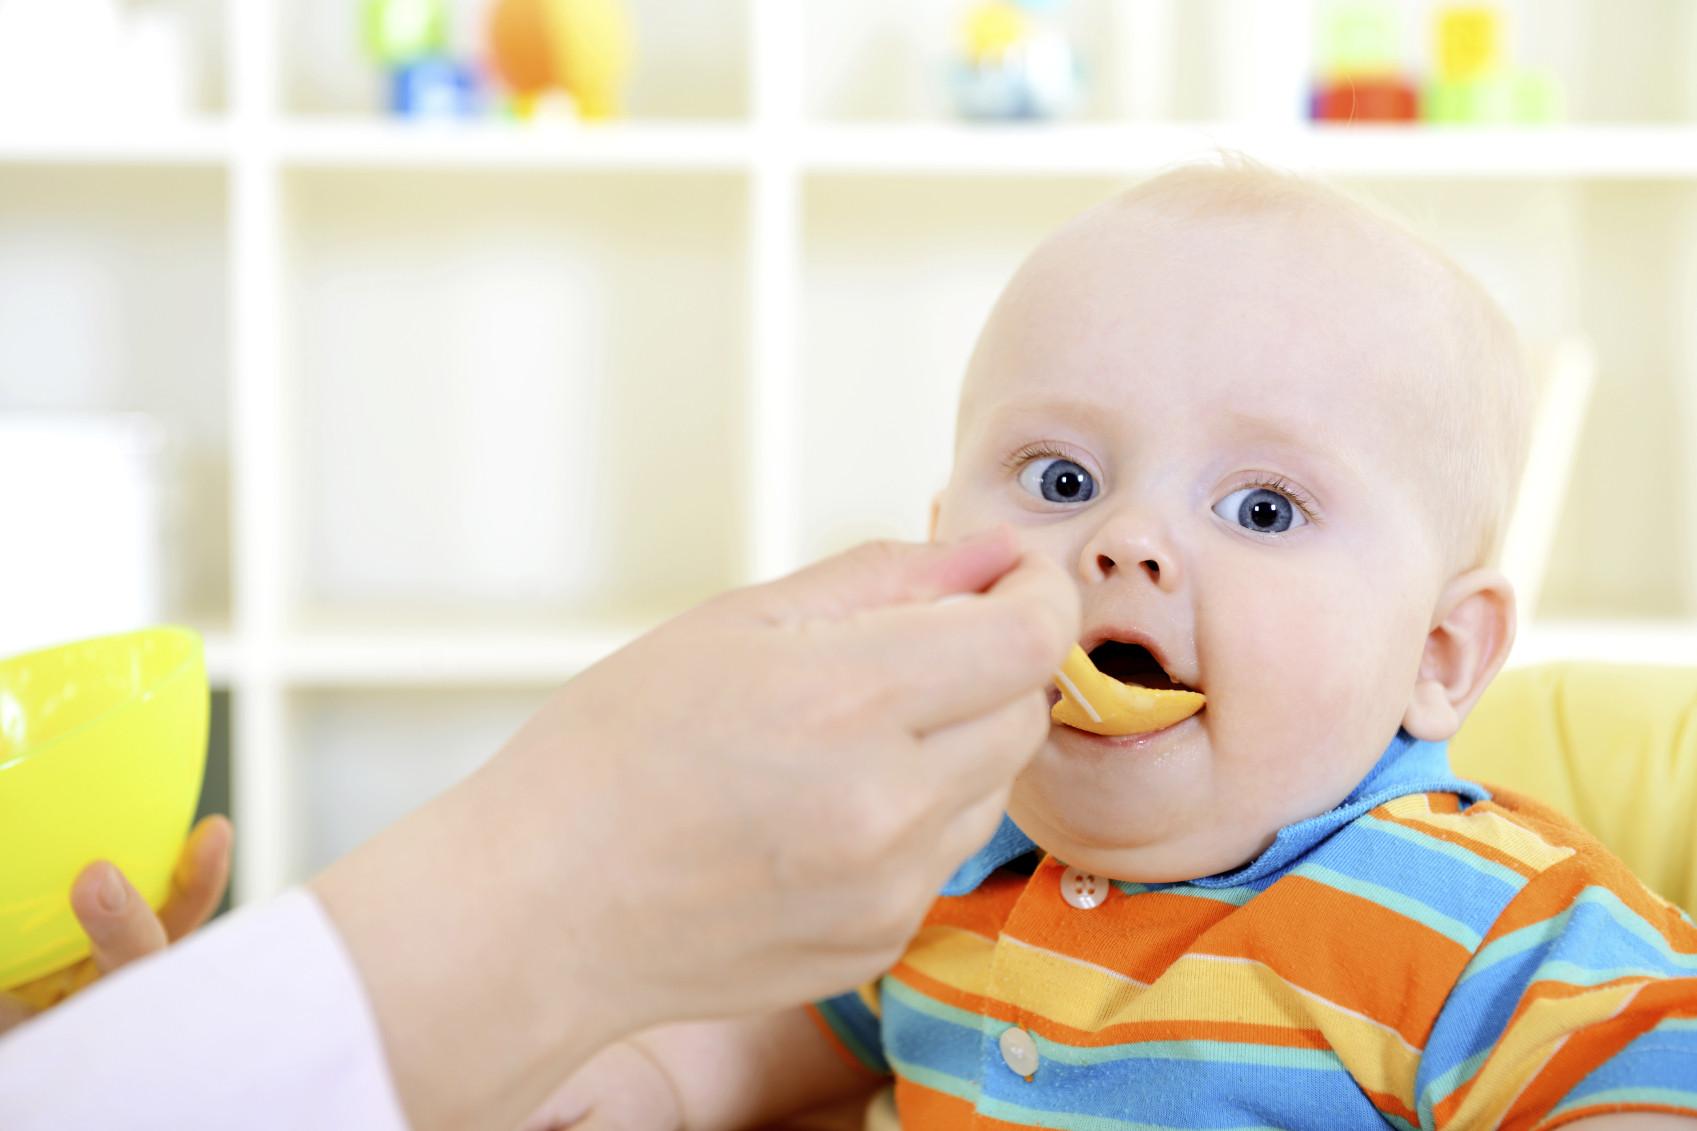 baby-solids-infant-eating-food-breakfast-iStock_000020035976_Medium